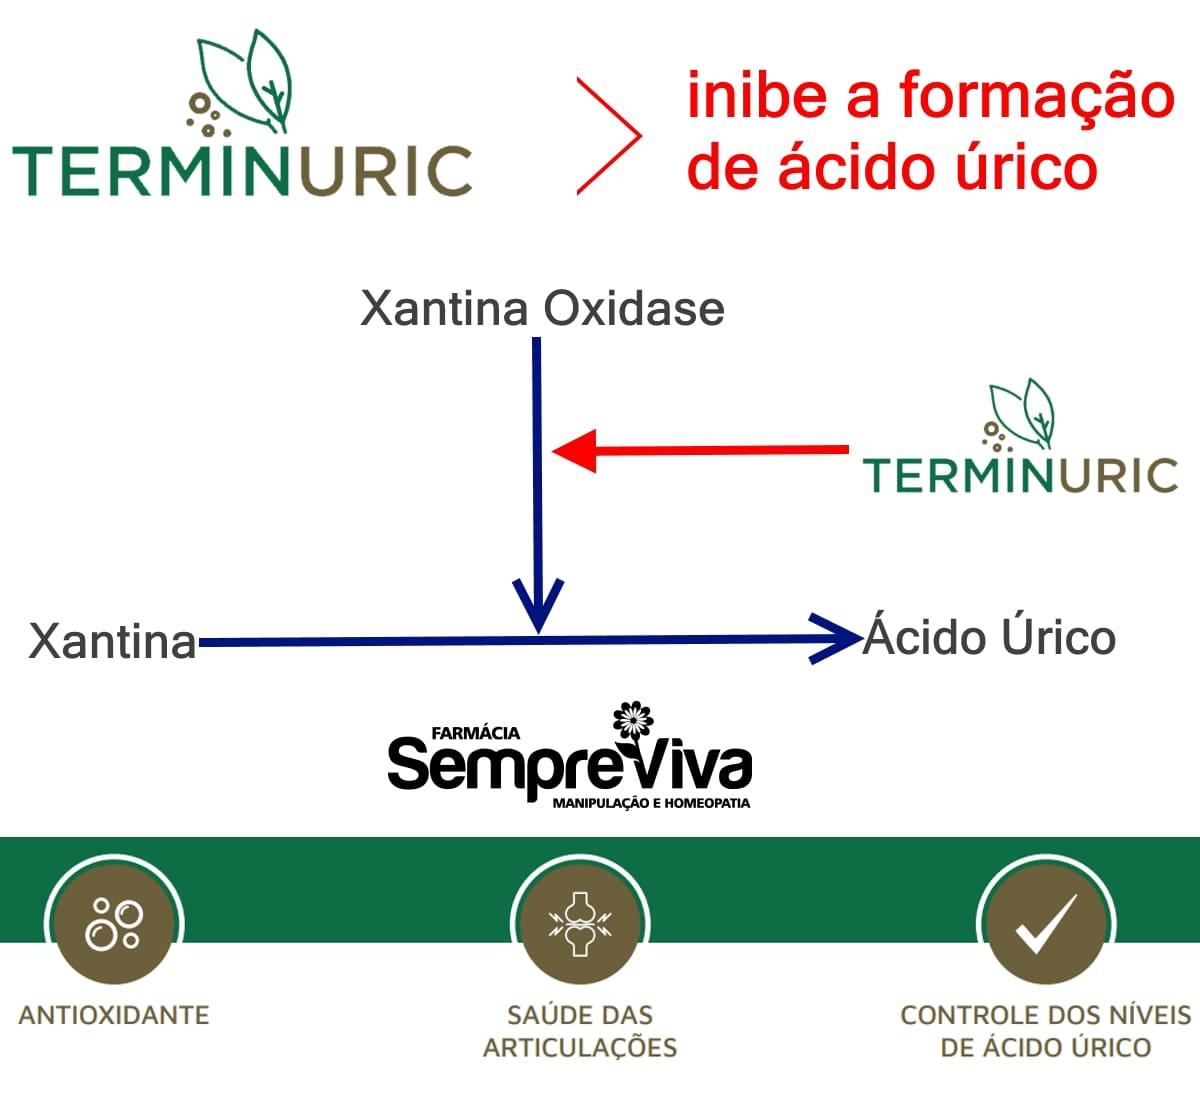 Terminuric